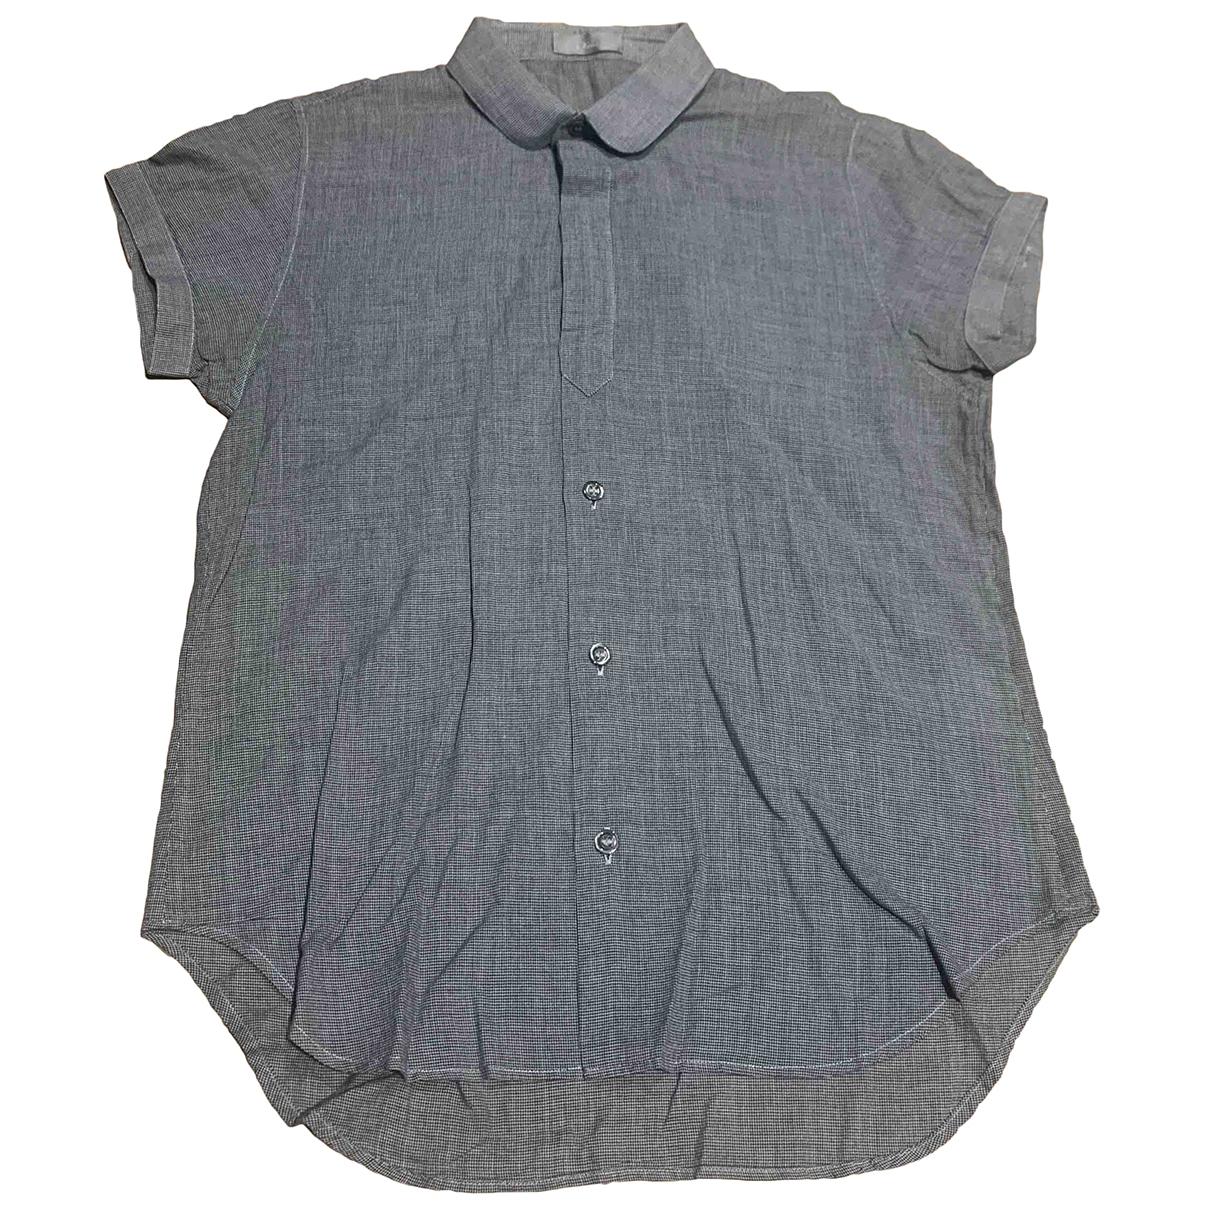 Dior Homme \N Hemden in  Grau Baumwolle